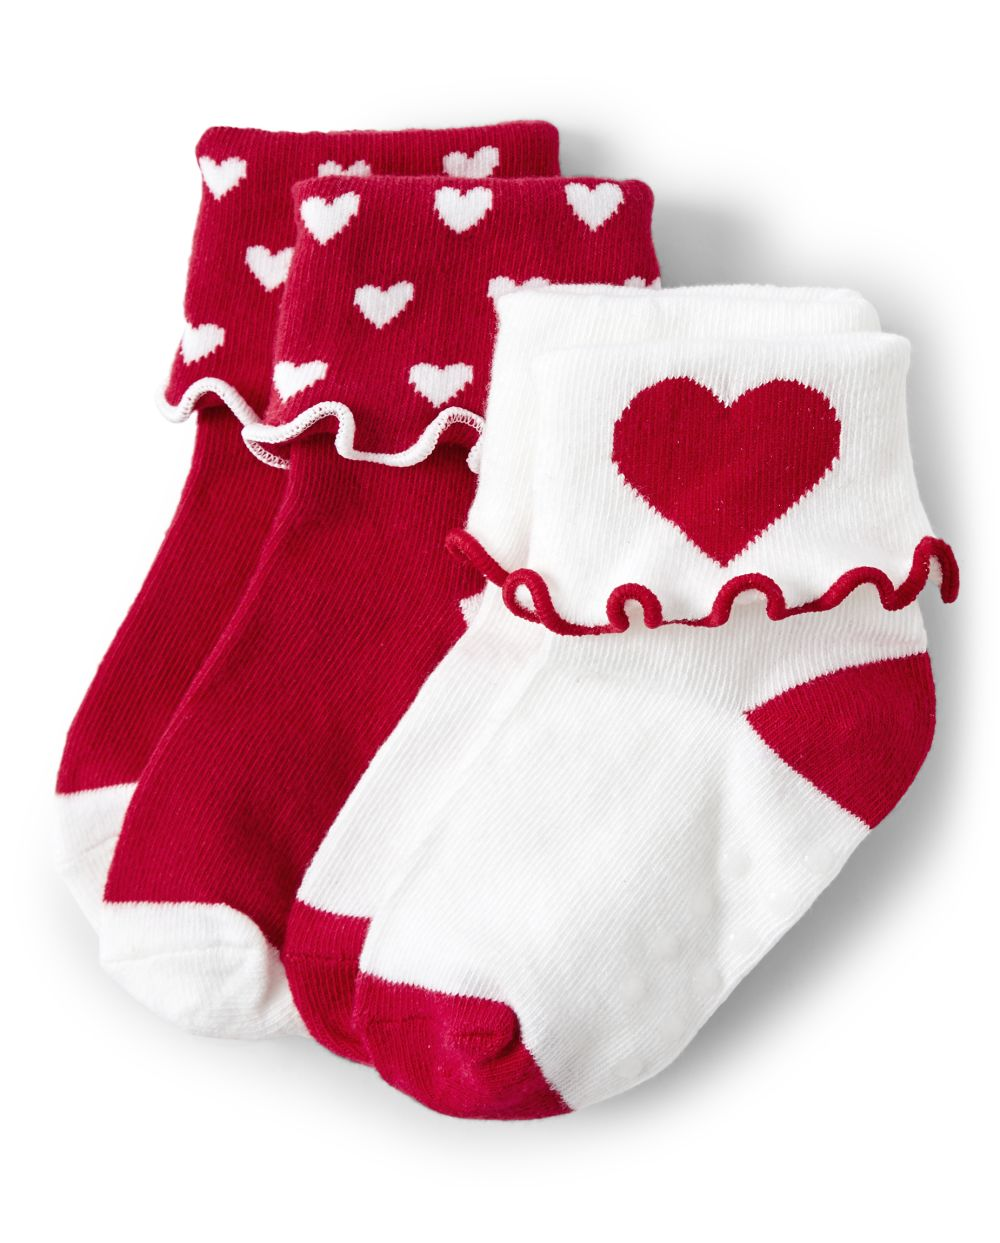 Girls Heart Turn Cuff Socks - Valentine Cutie